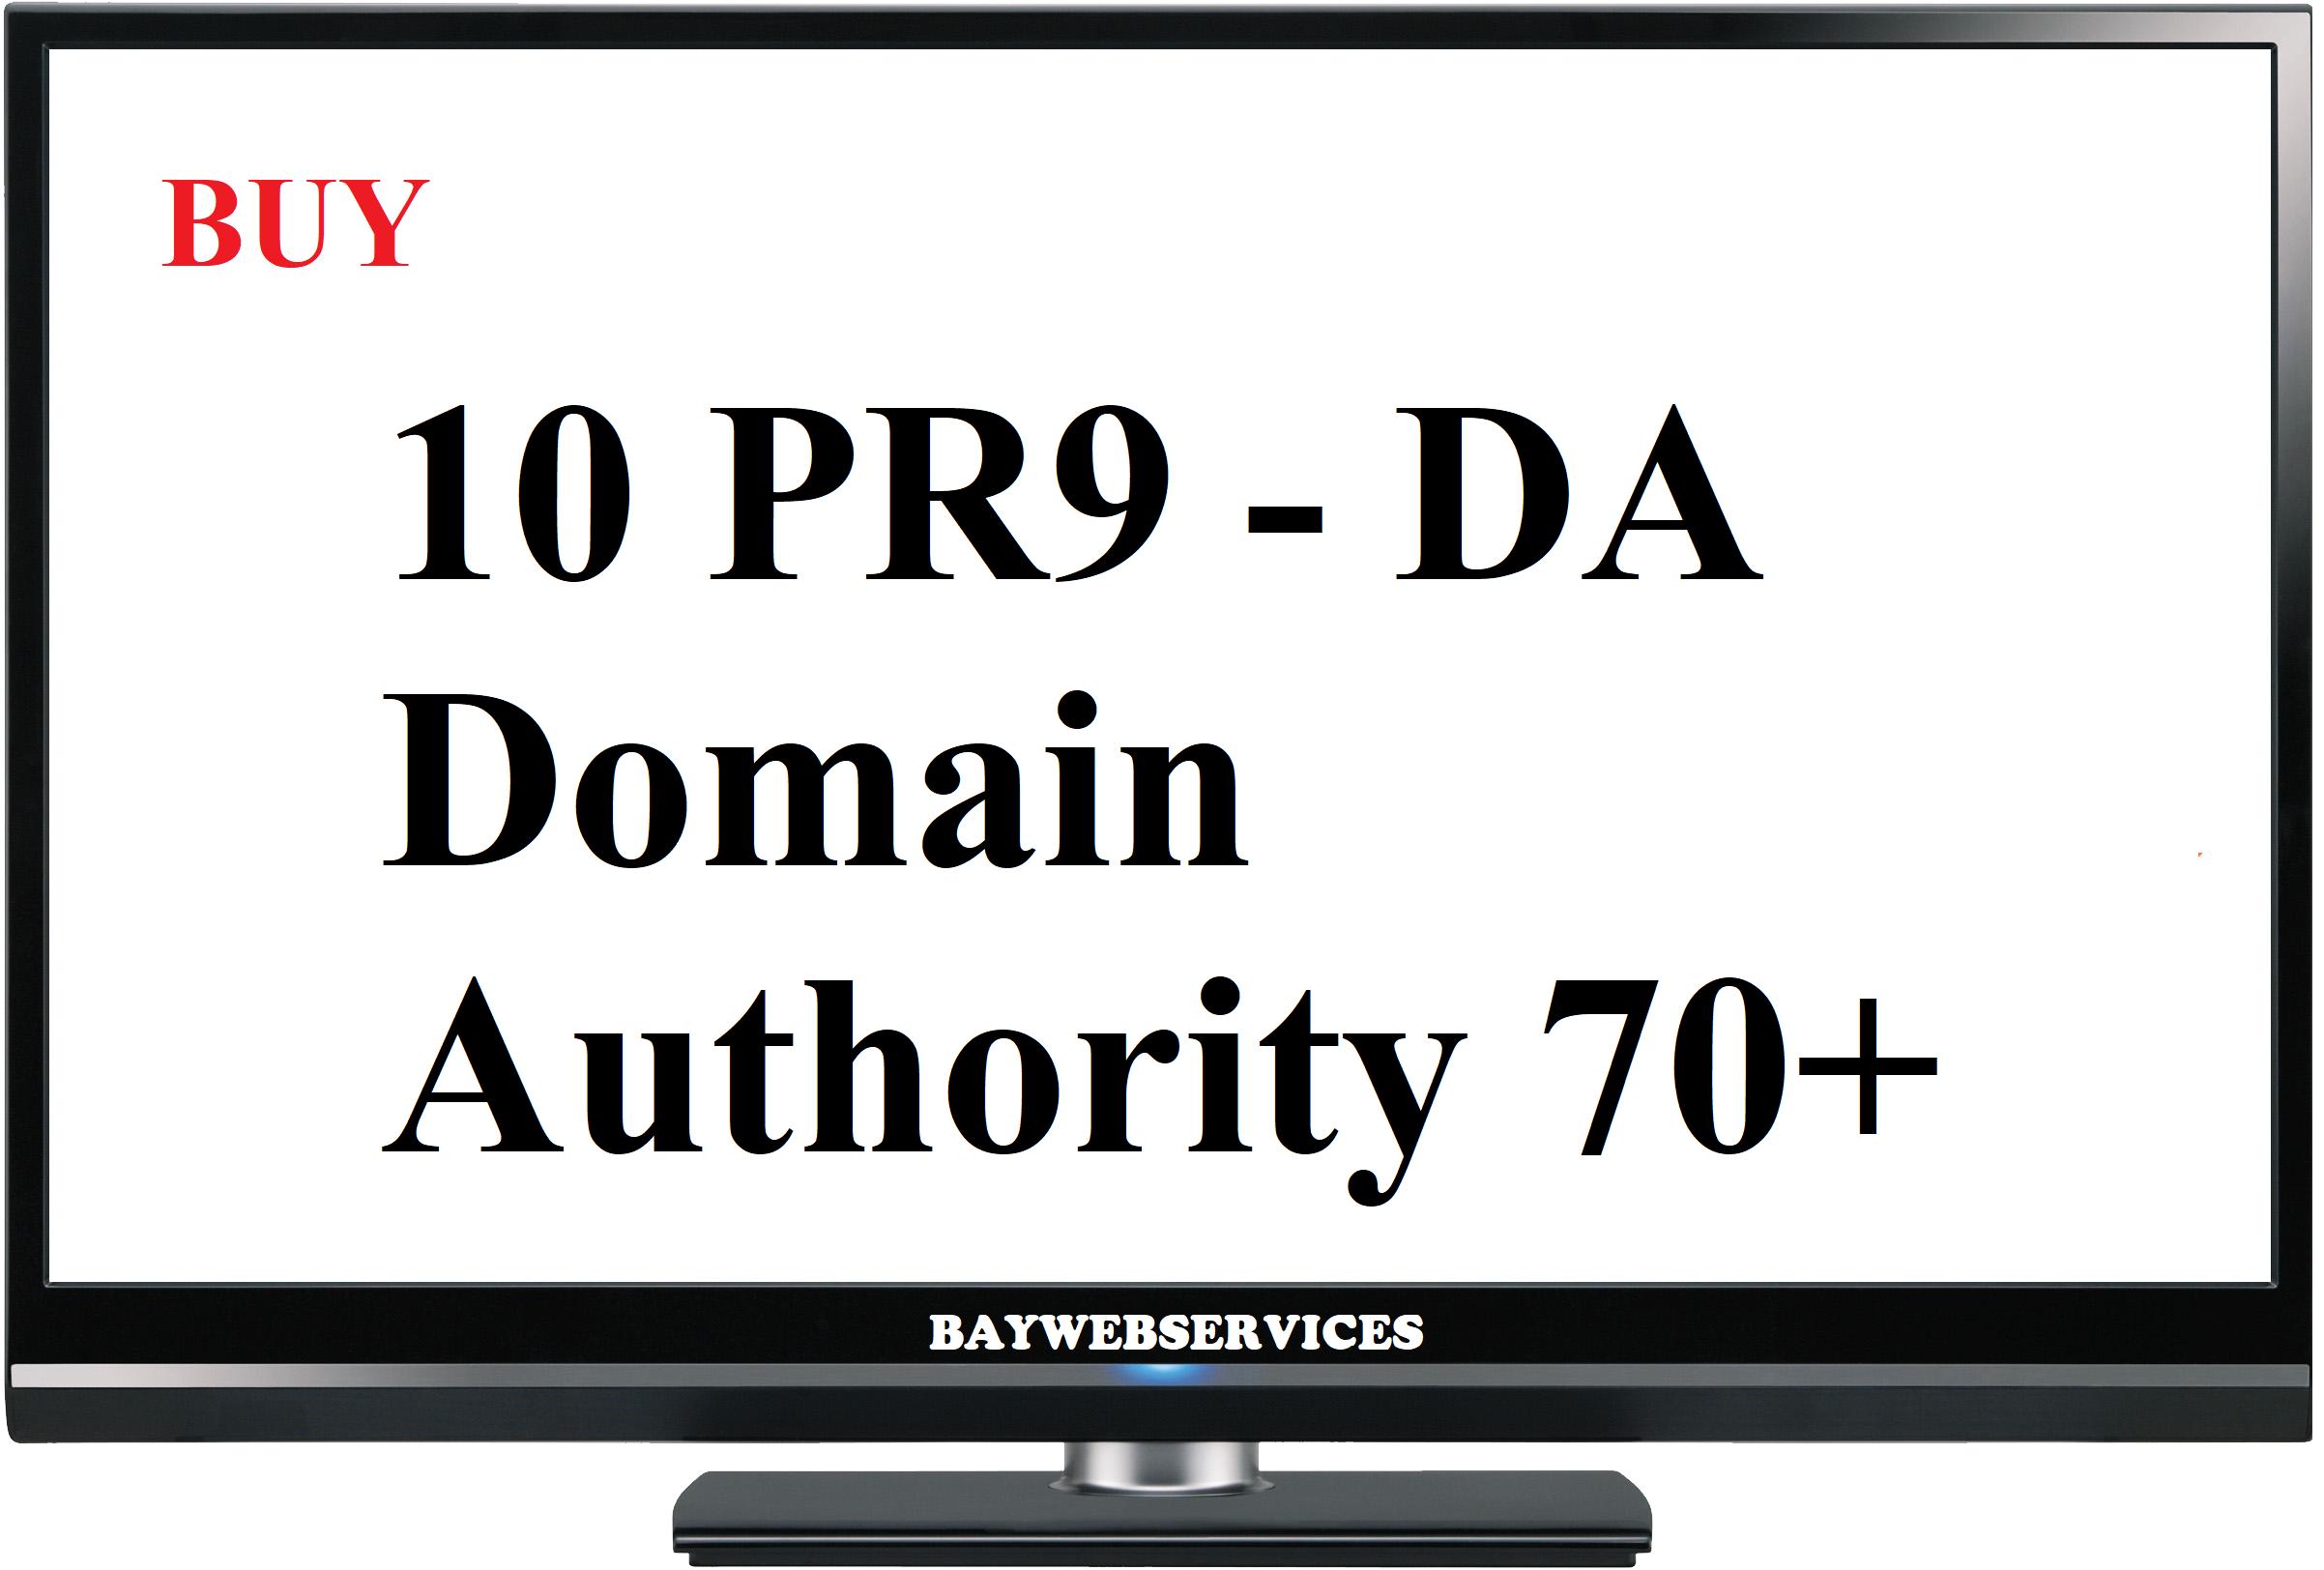 10 PR9 - DA Domain Authority 70+ Backlinks